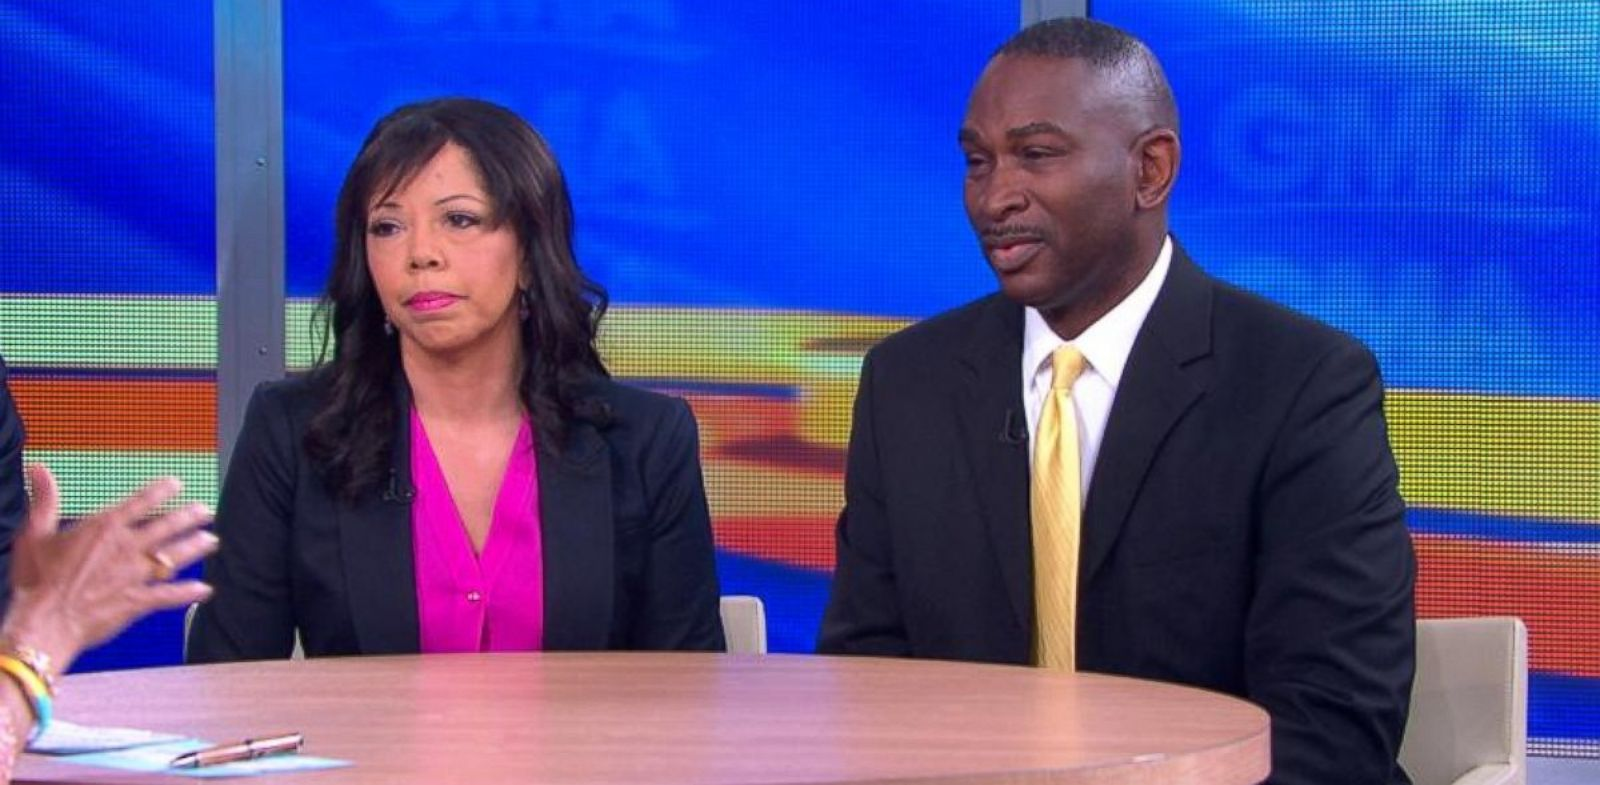 PHOTO: Jordan Davis parents, Lucia McBath and Ronald Davis, on Good Morning America, Feb. 19, 2014.